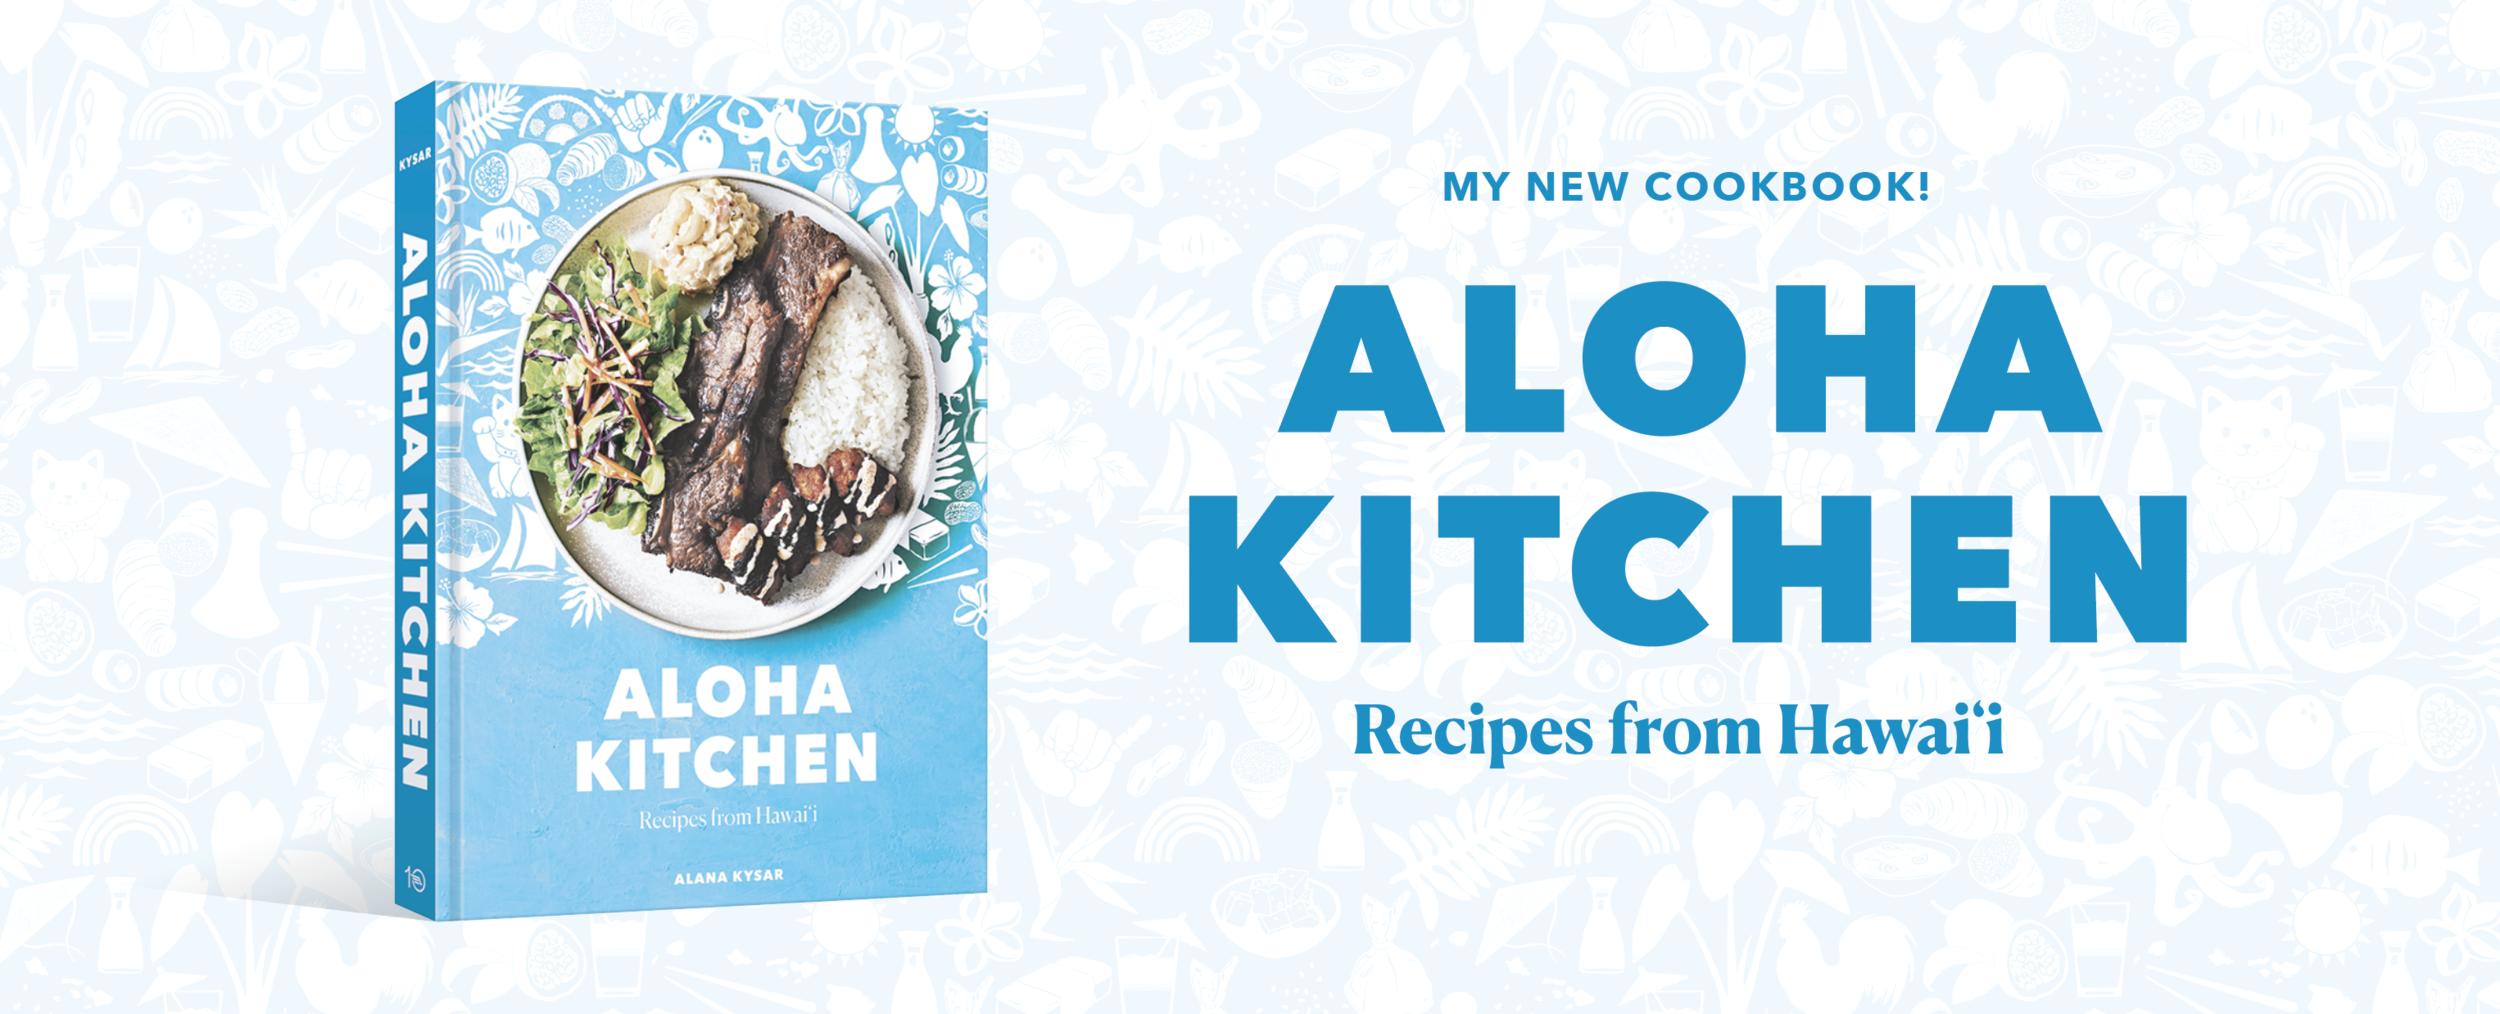 aloha-kitchen-cookbook-header.png